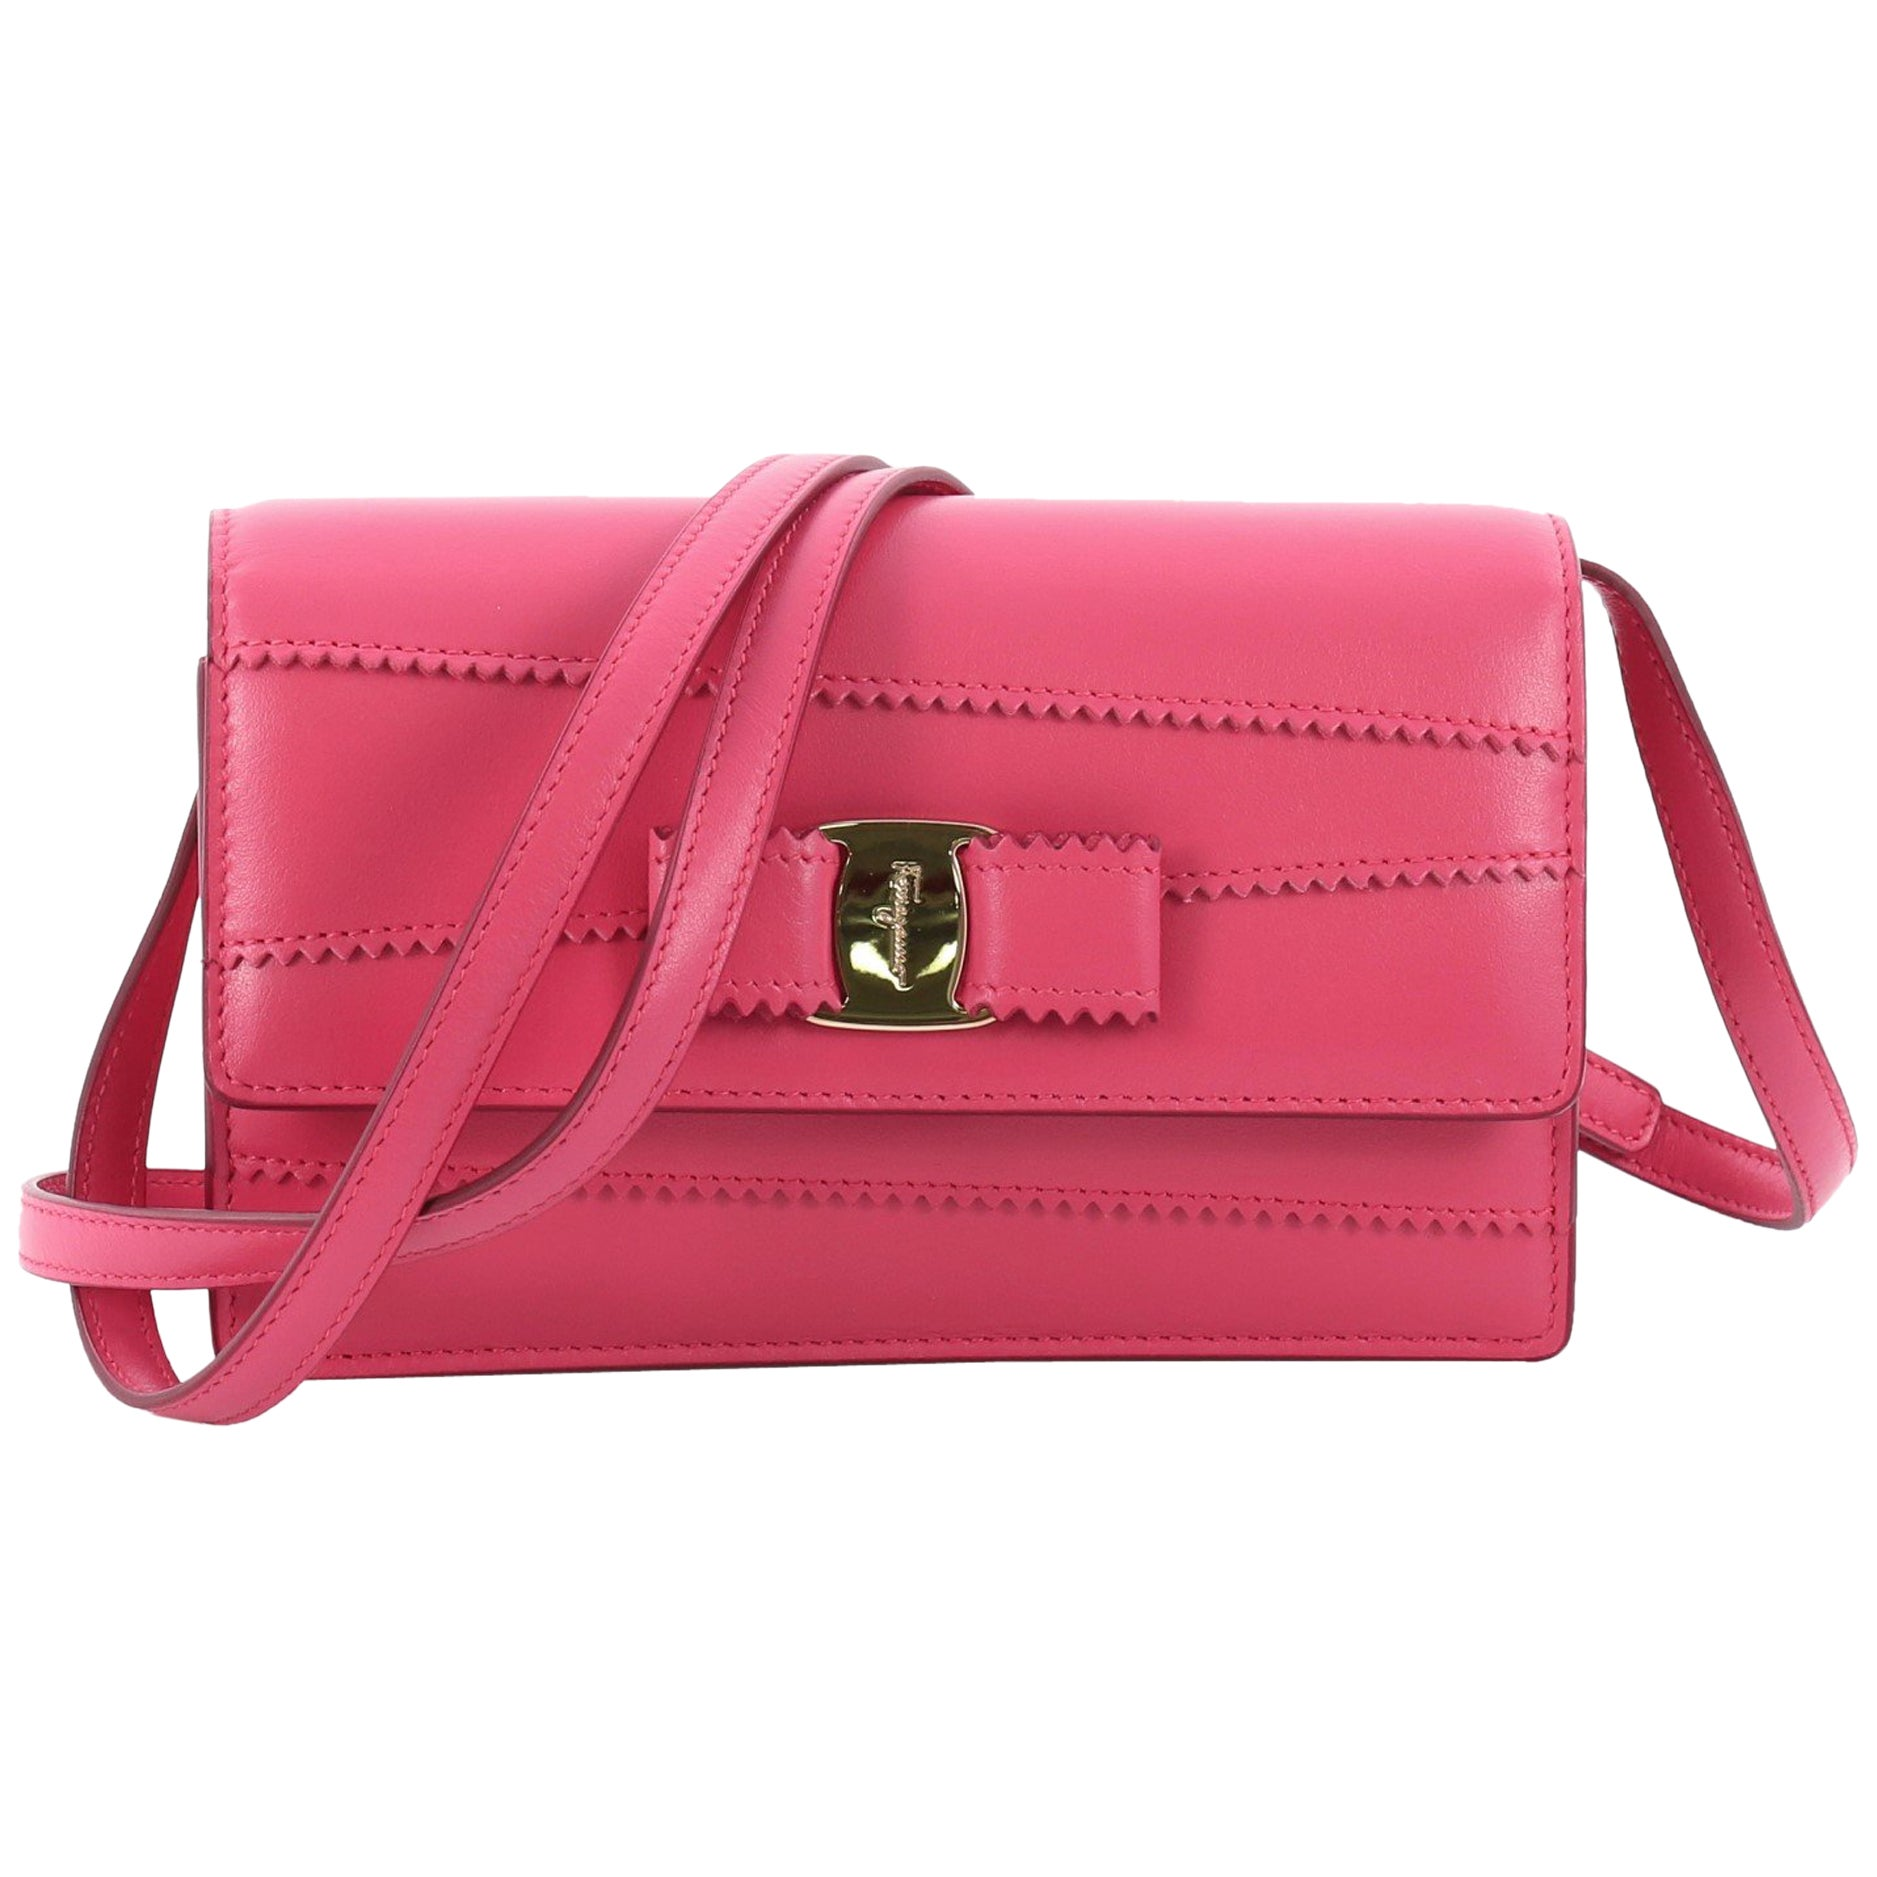 576d9b176d7e Salvatore Ferragamo Ginny Crossbody Bag Stitched Leather Mini at 1stdibs